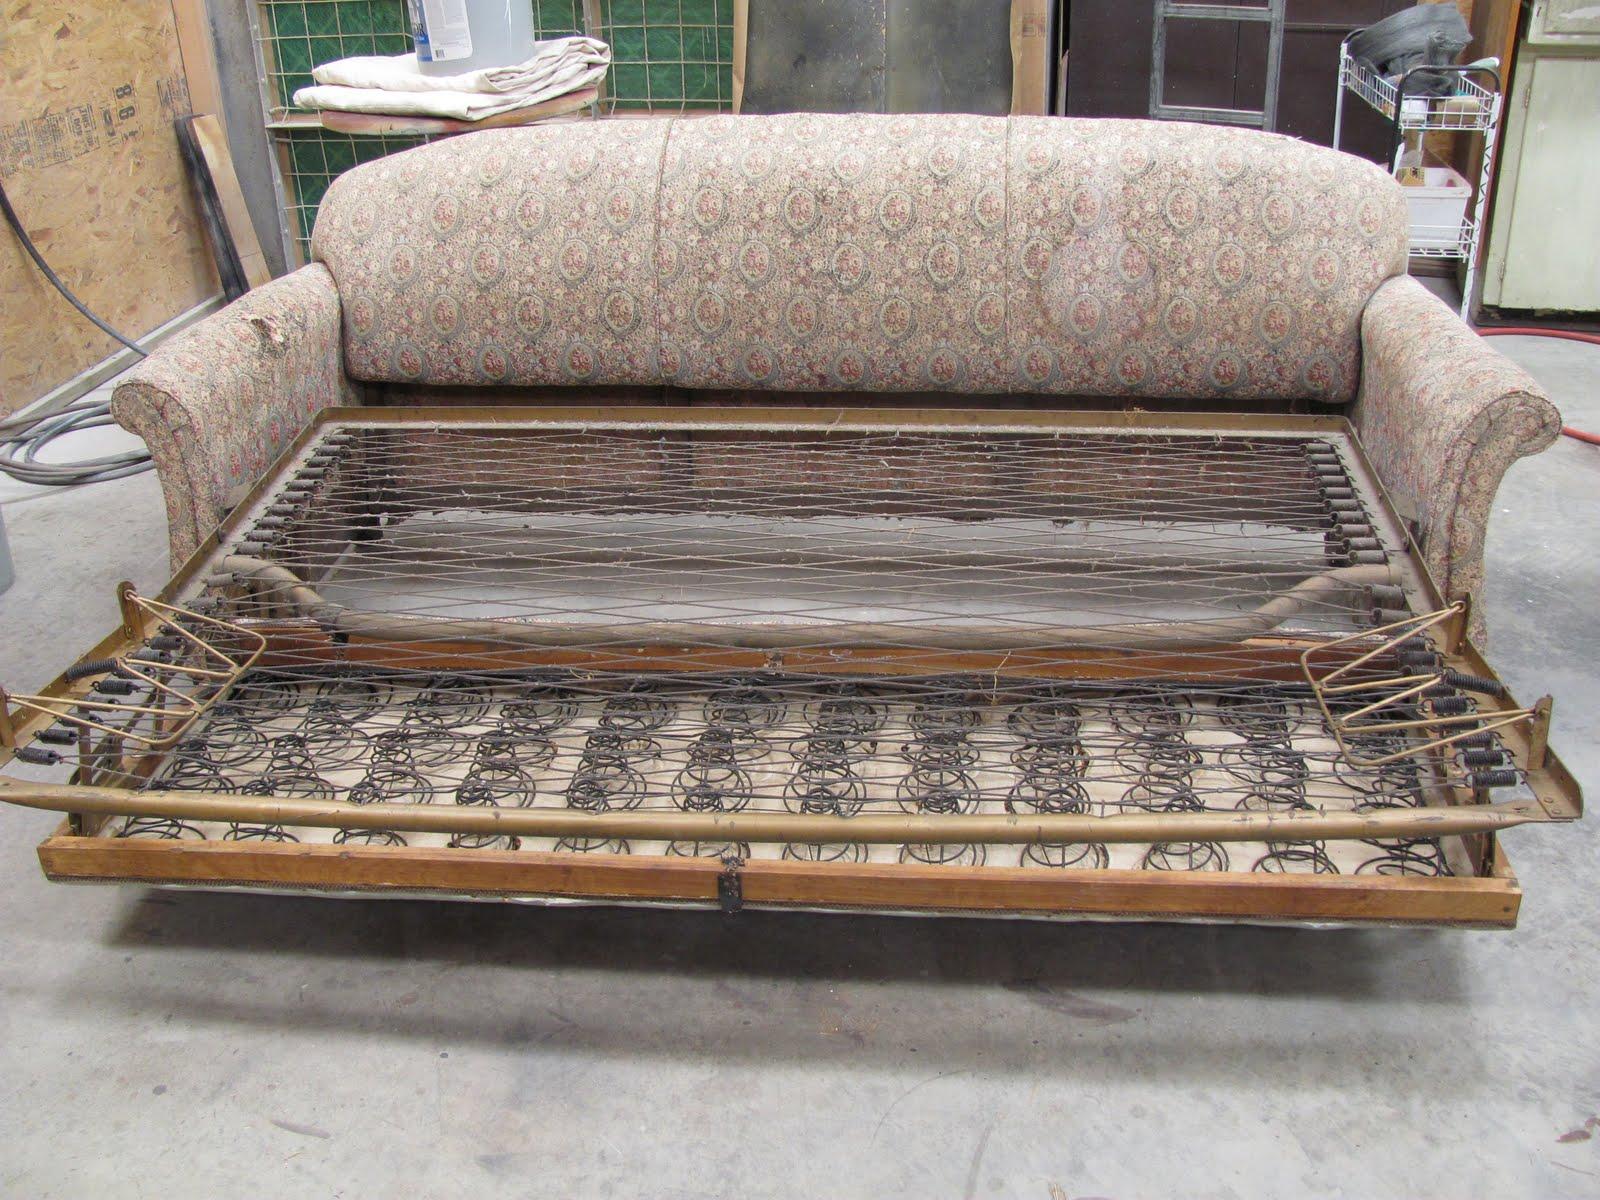 Thomas Nelson Furniture Restoration Antique Sleeper Sofa